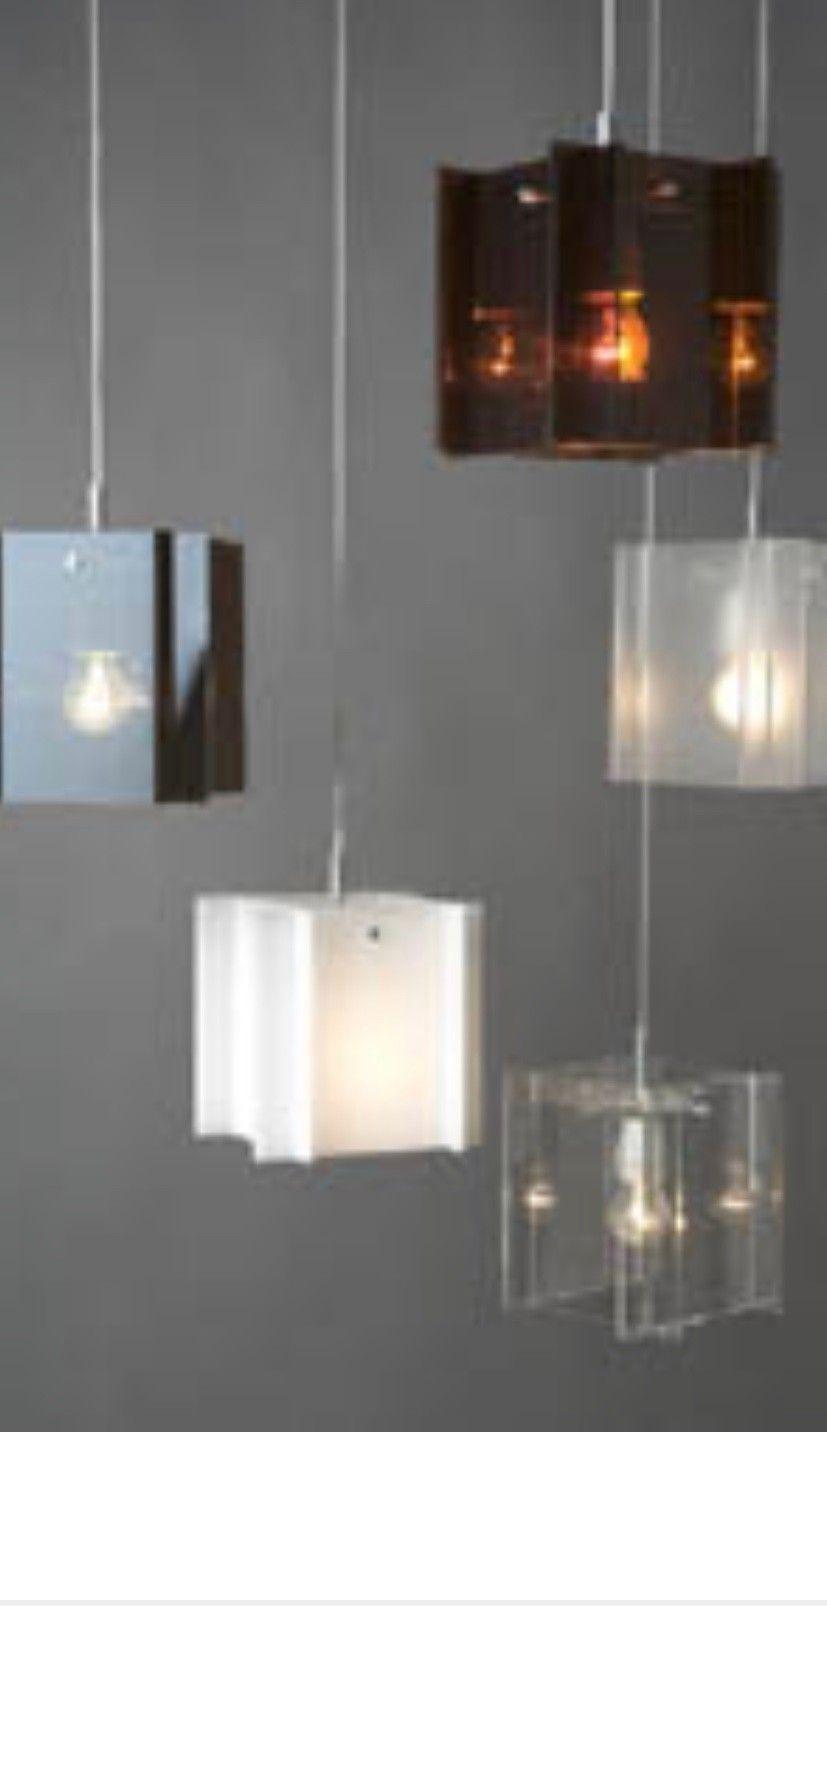 Arne Jacobsen Hotel Royal Lampe   FINN.no